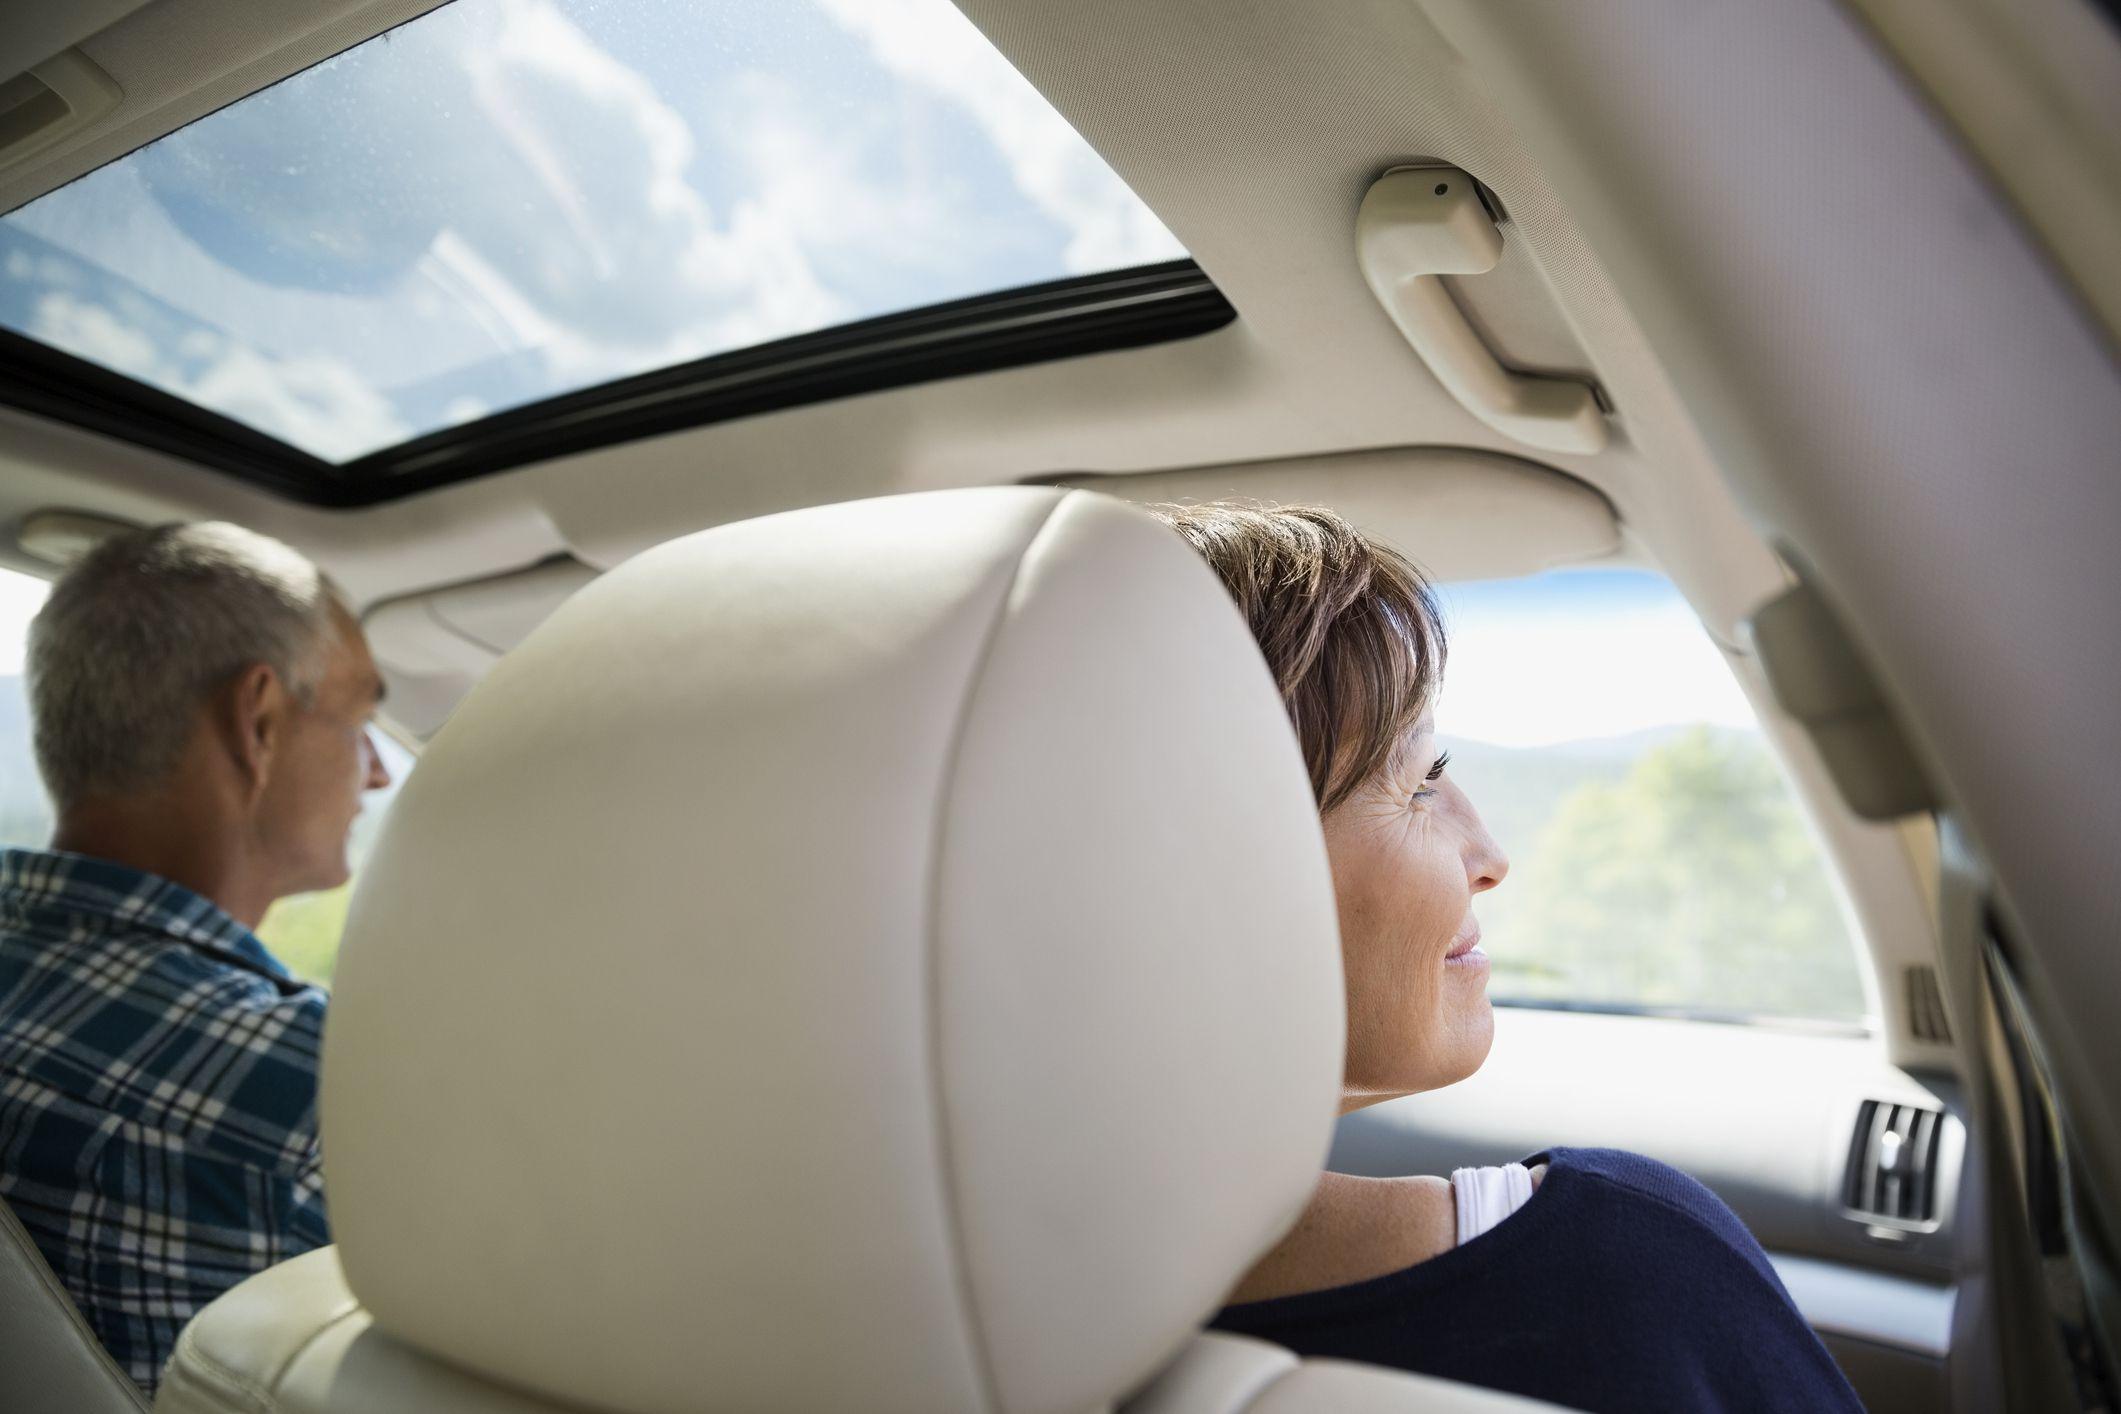 Moonroof Vs Sunroof In Vehicles